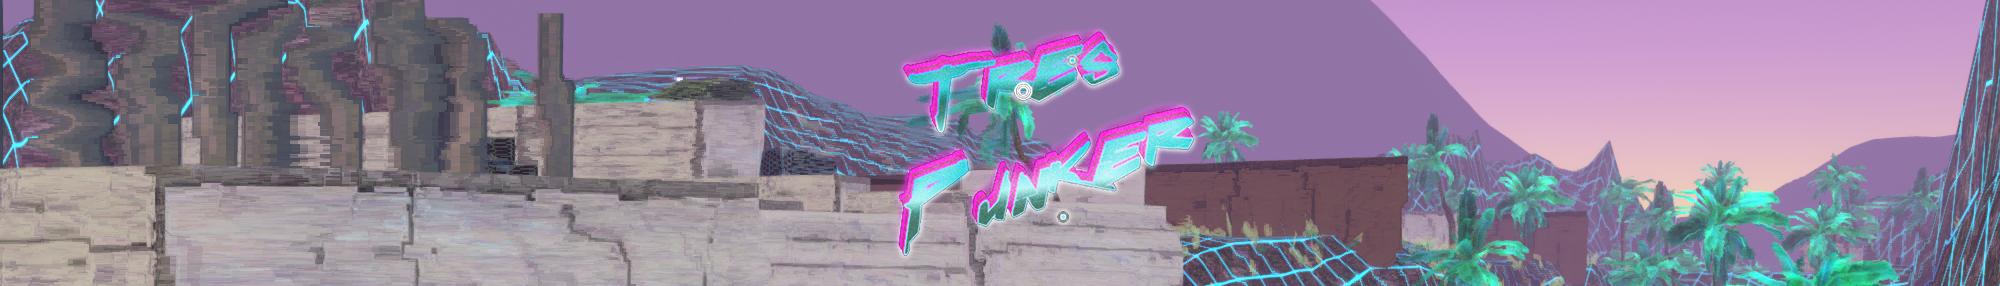 TresPunker